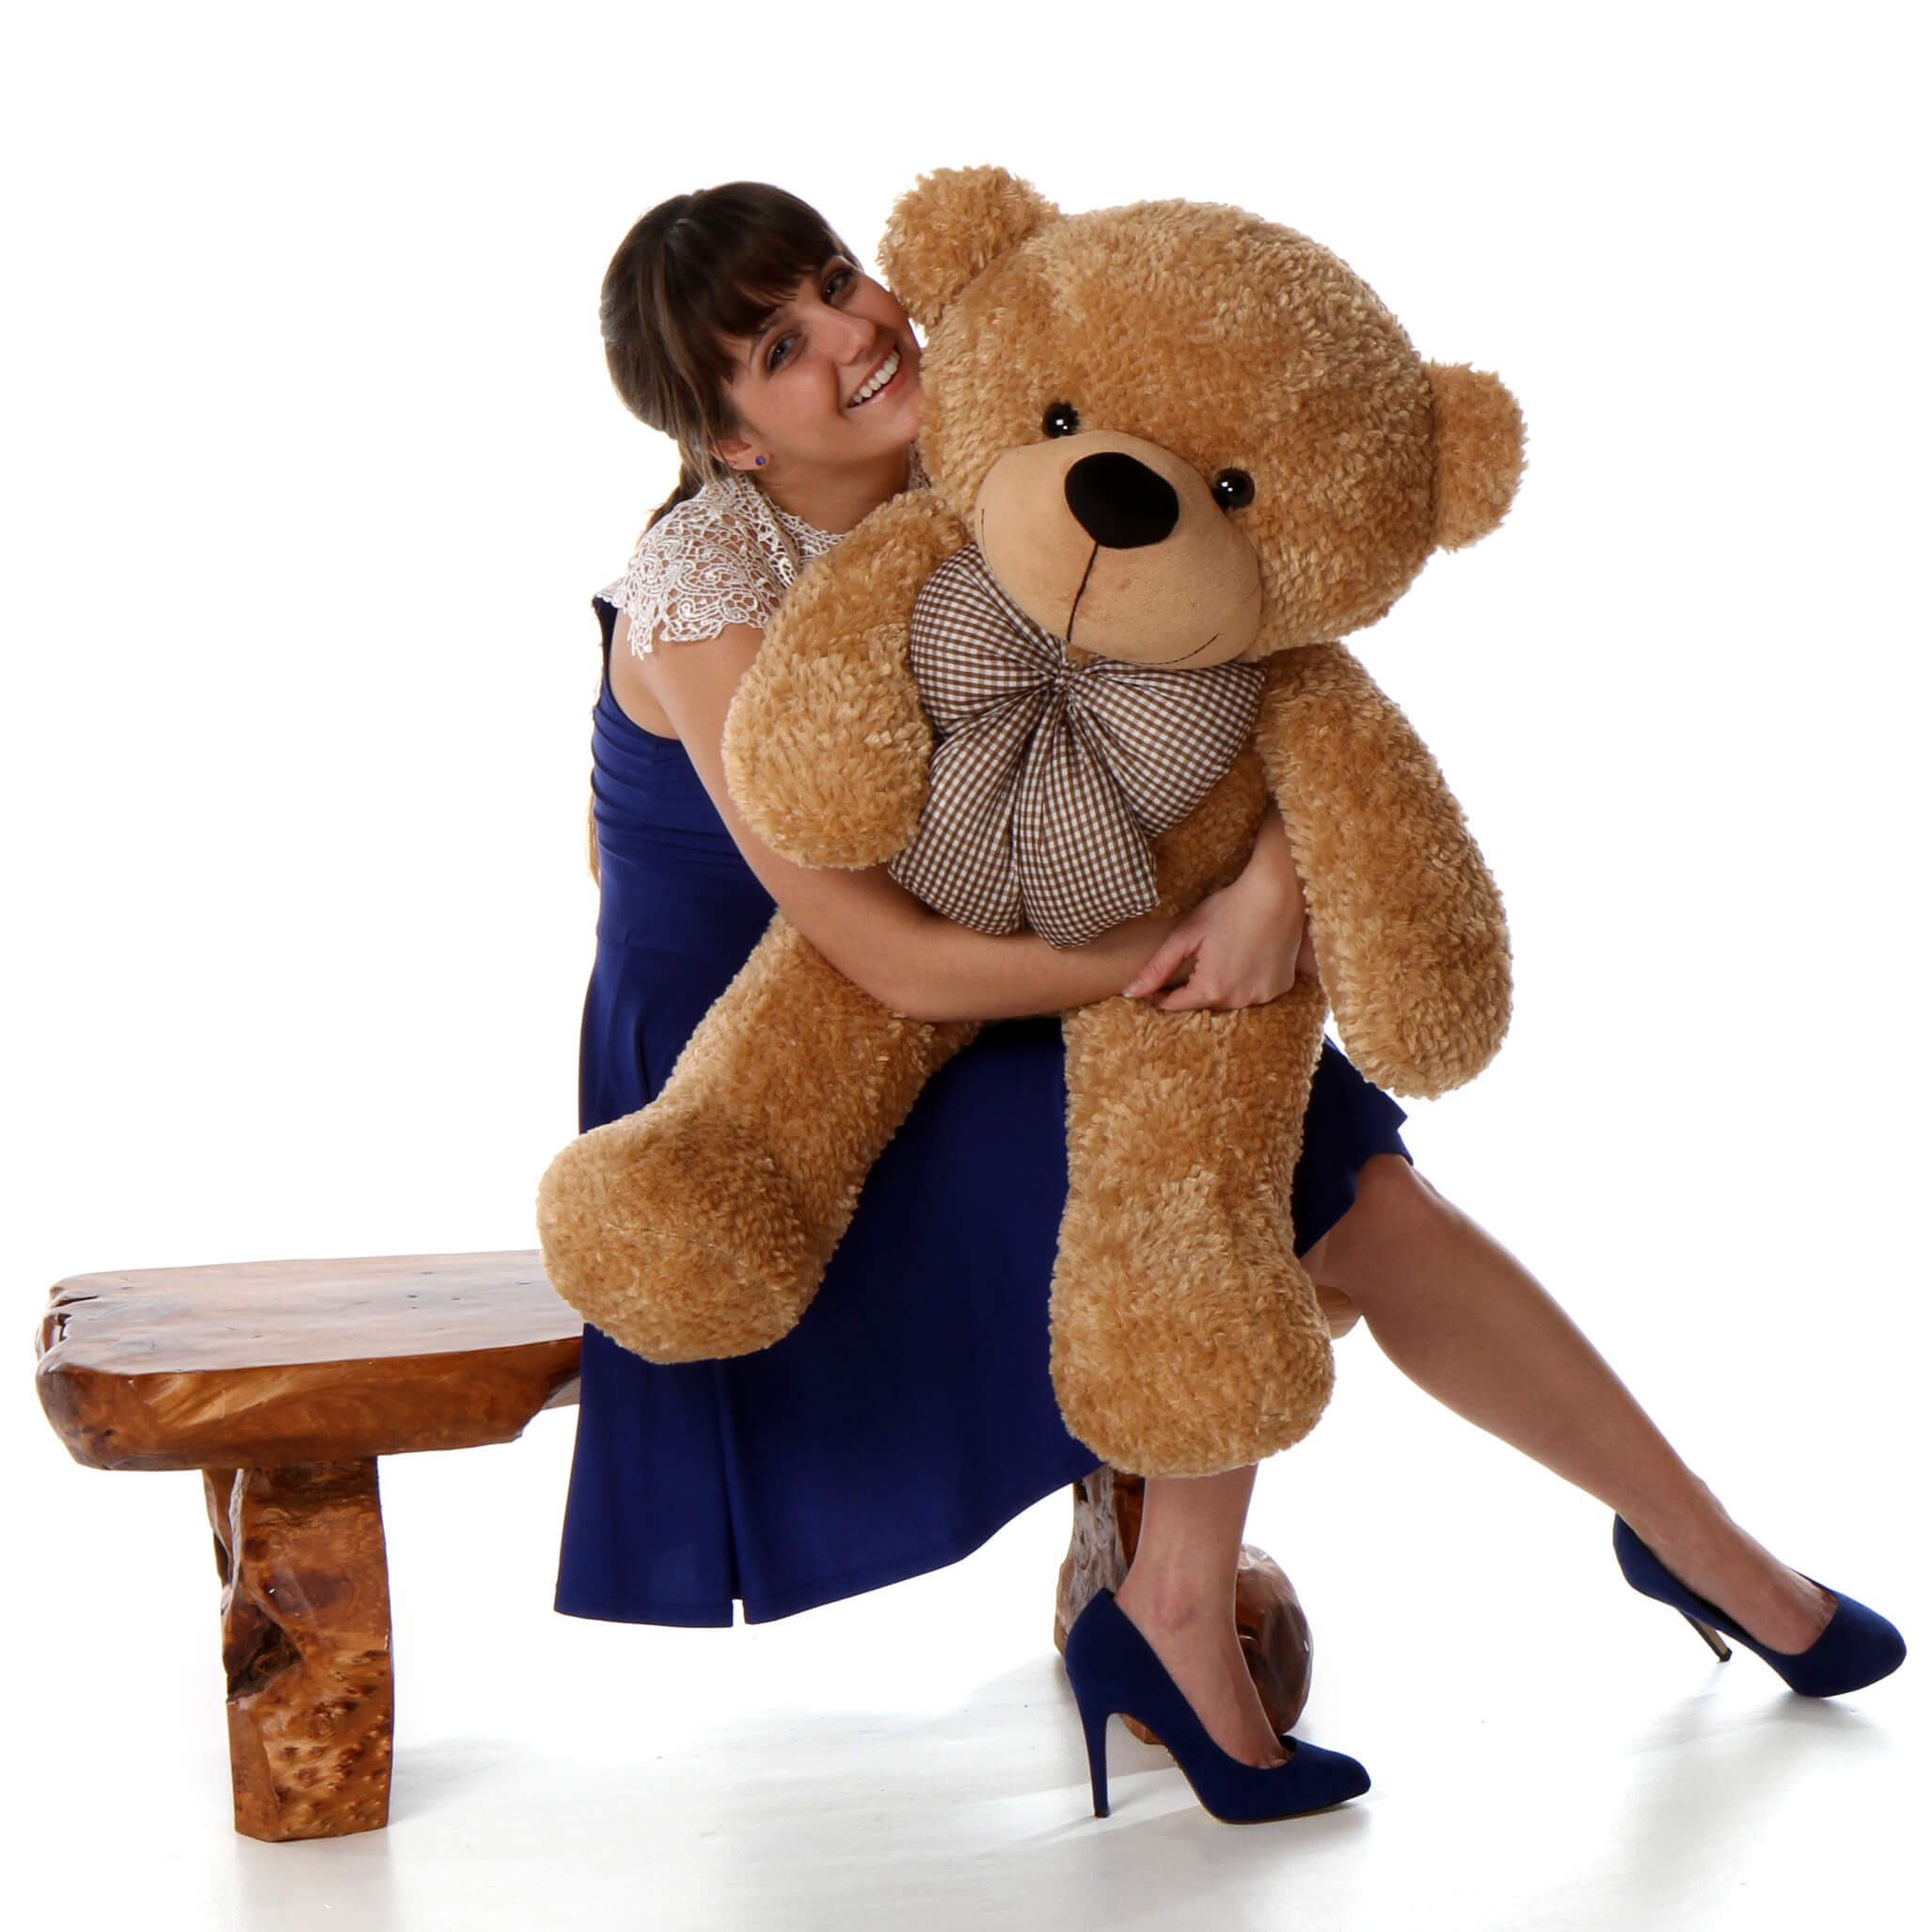 38in-huge-amber-brown-teddy-bear-shaggy-cuddles-1.jpg